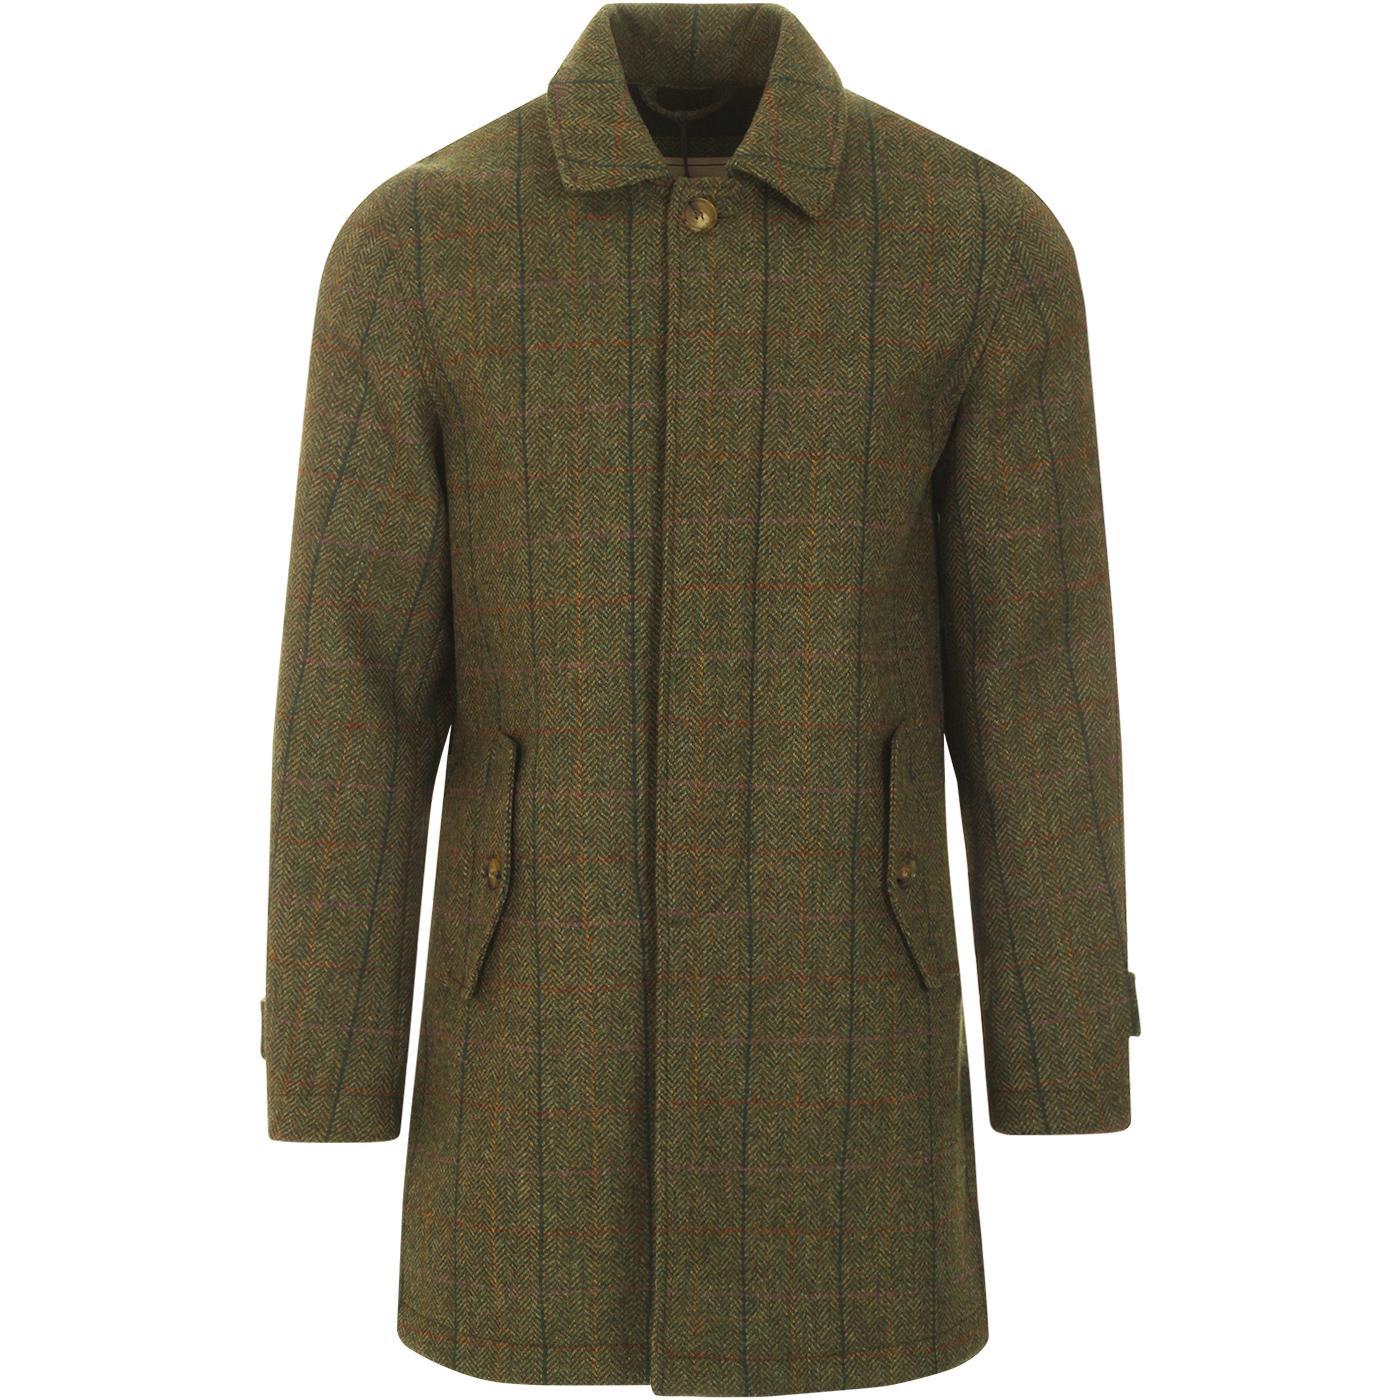 BARACUTA G10 Authentic Fit Tech Shetland Coat